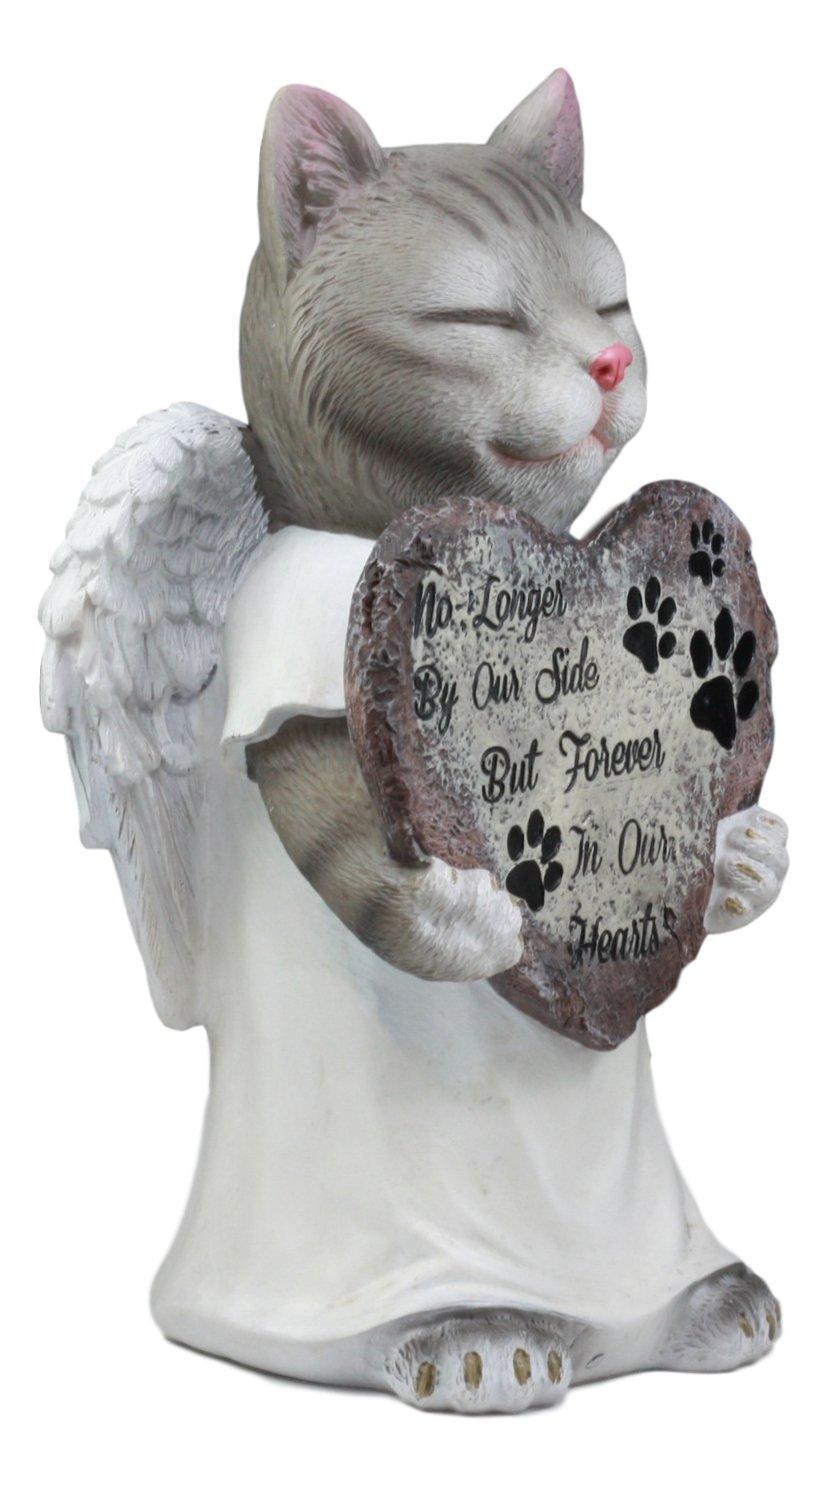 Ebros Celestial Angel Grey Cat in White Tunic Robe Pet Memorial Figurine Inspirational Decorative Feline American Shorthair Cat Kitten Sculpture